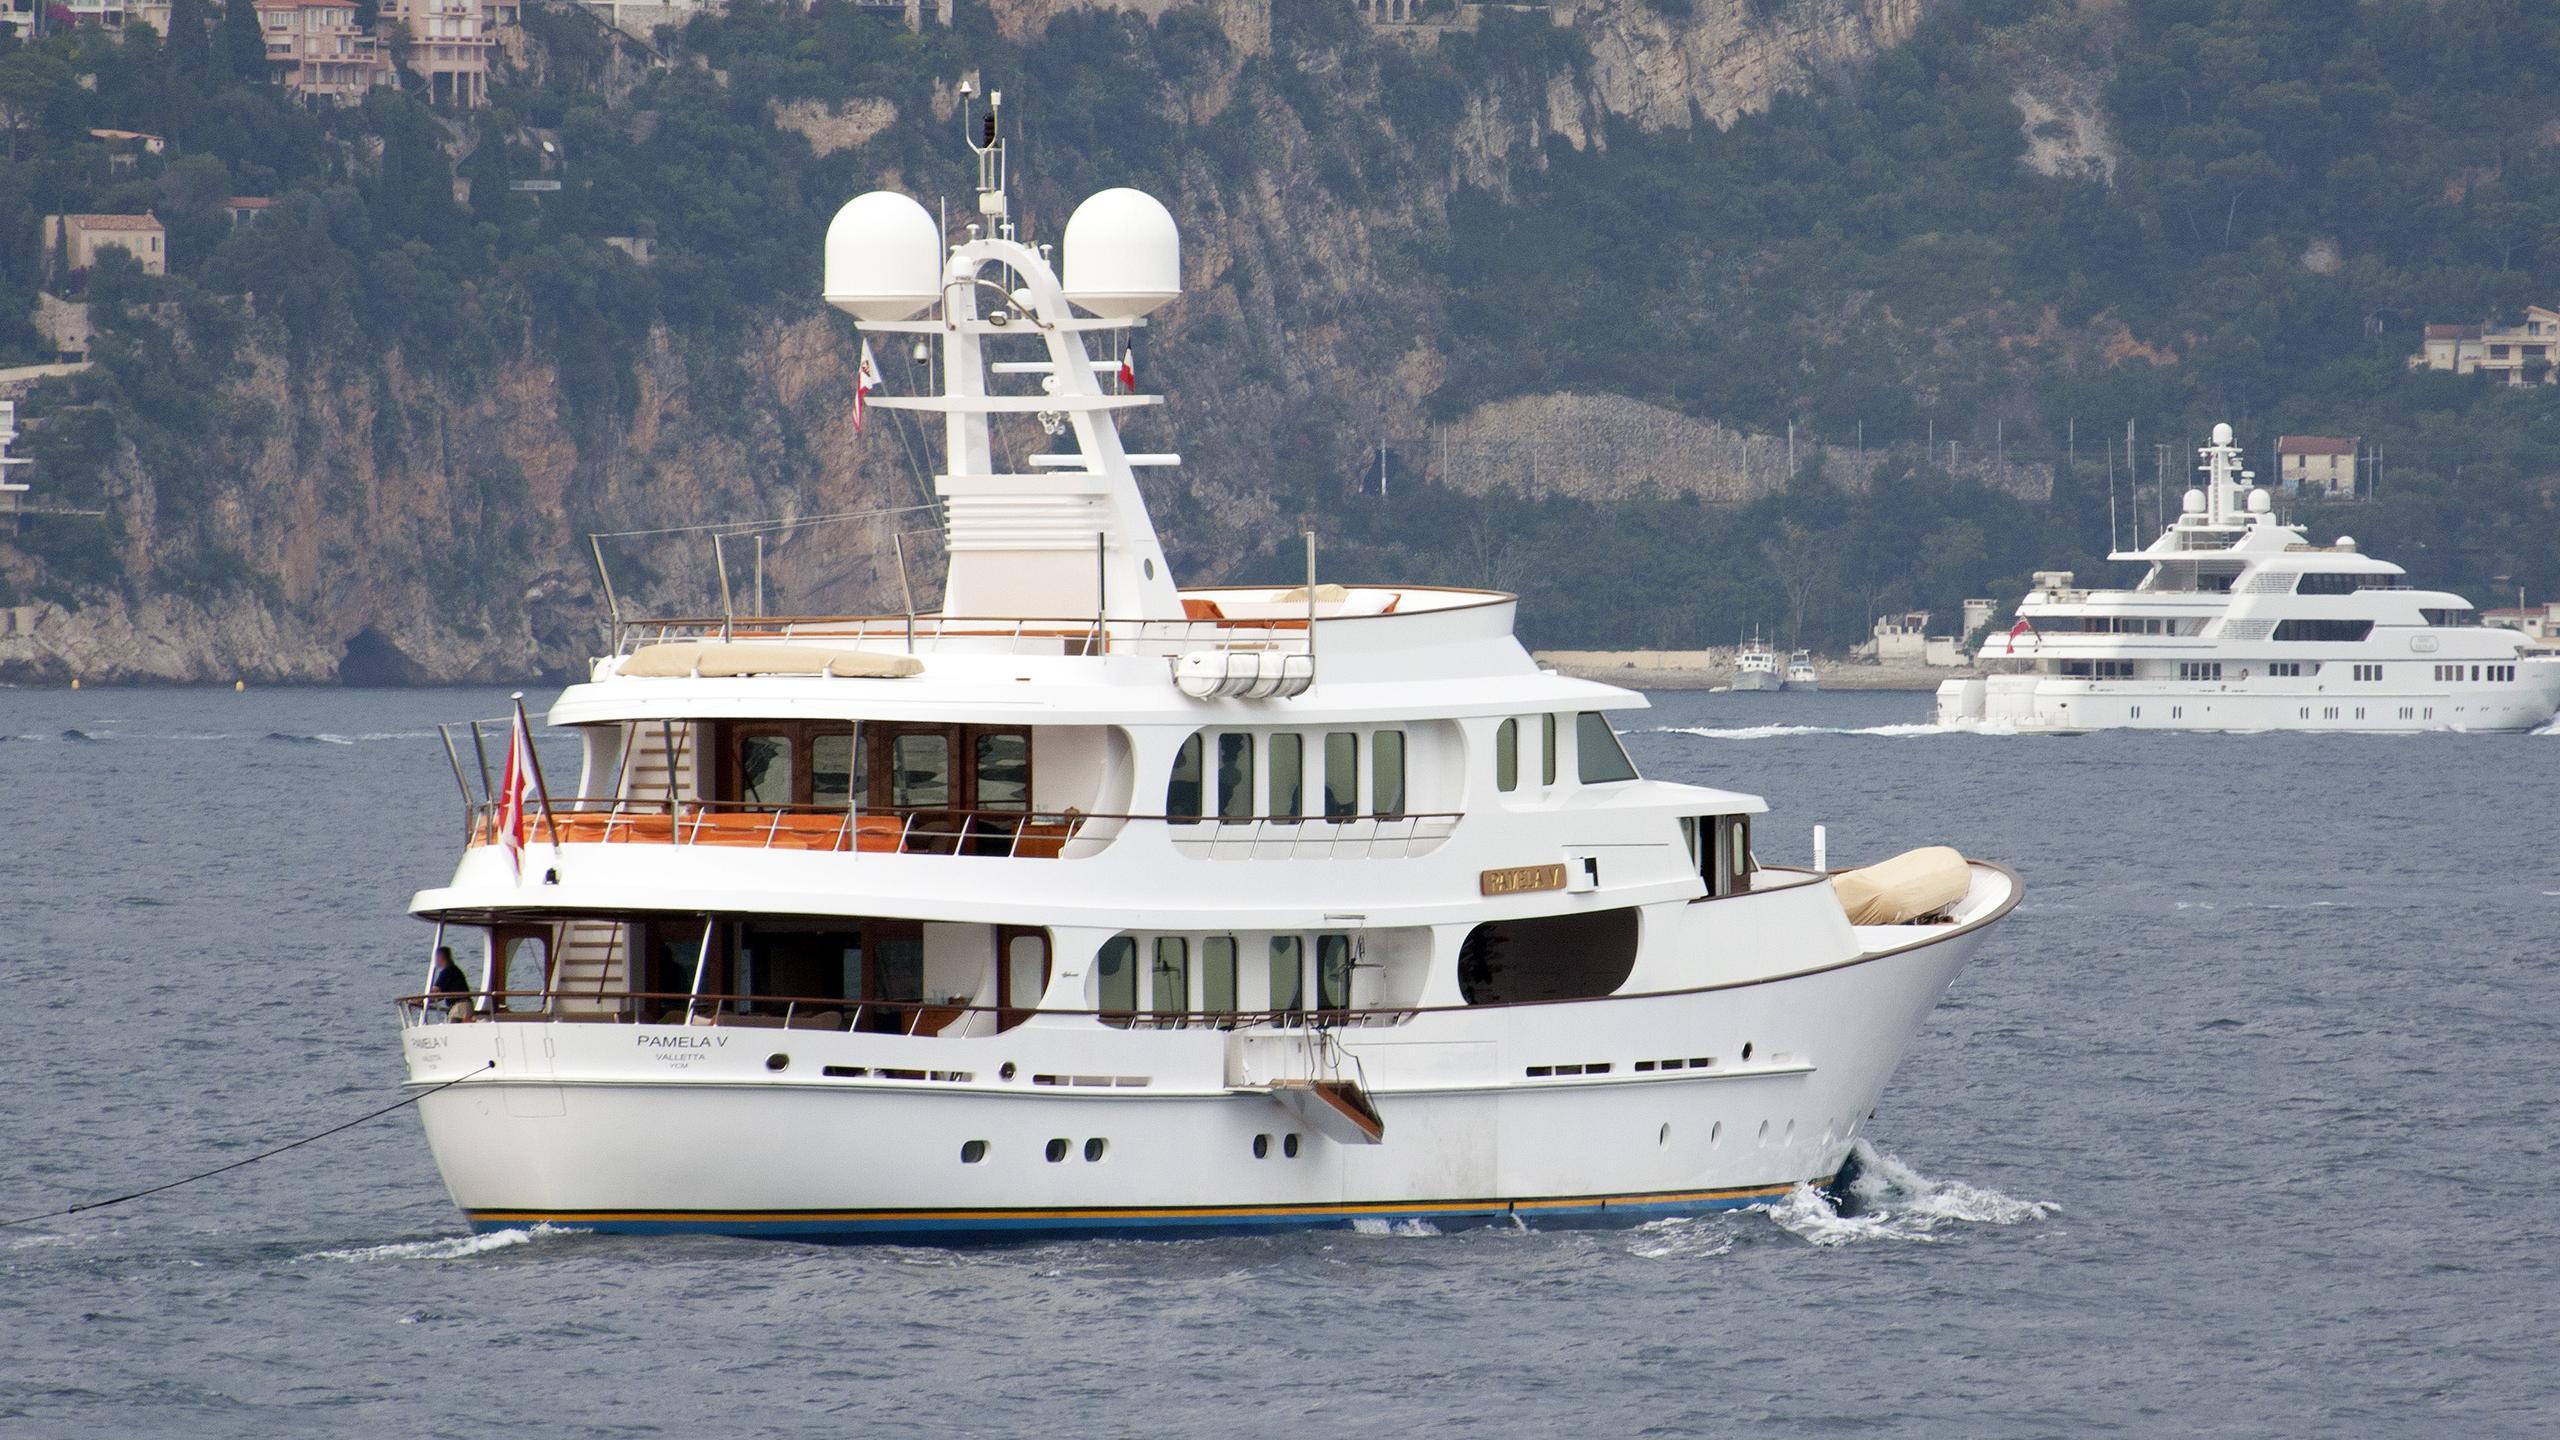 pamela-v-motor-yacht-hakvoort-2011-45m-stern